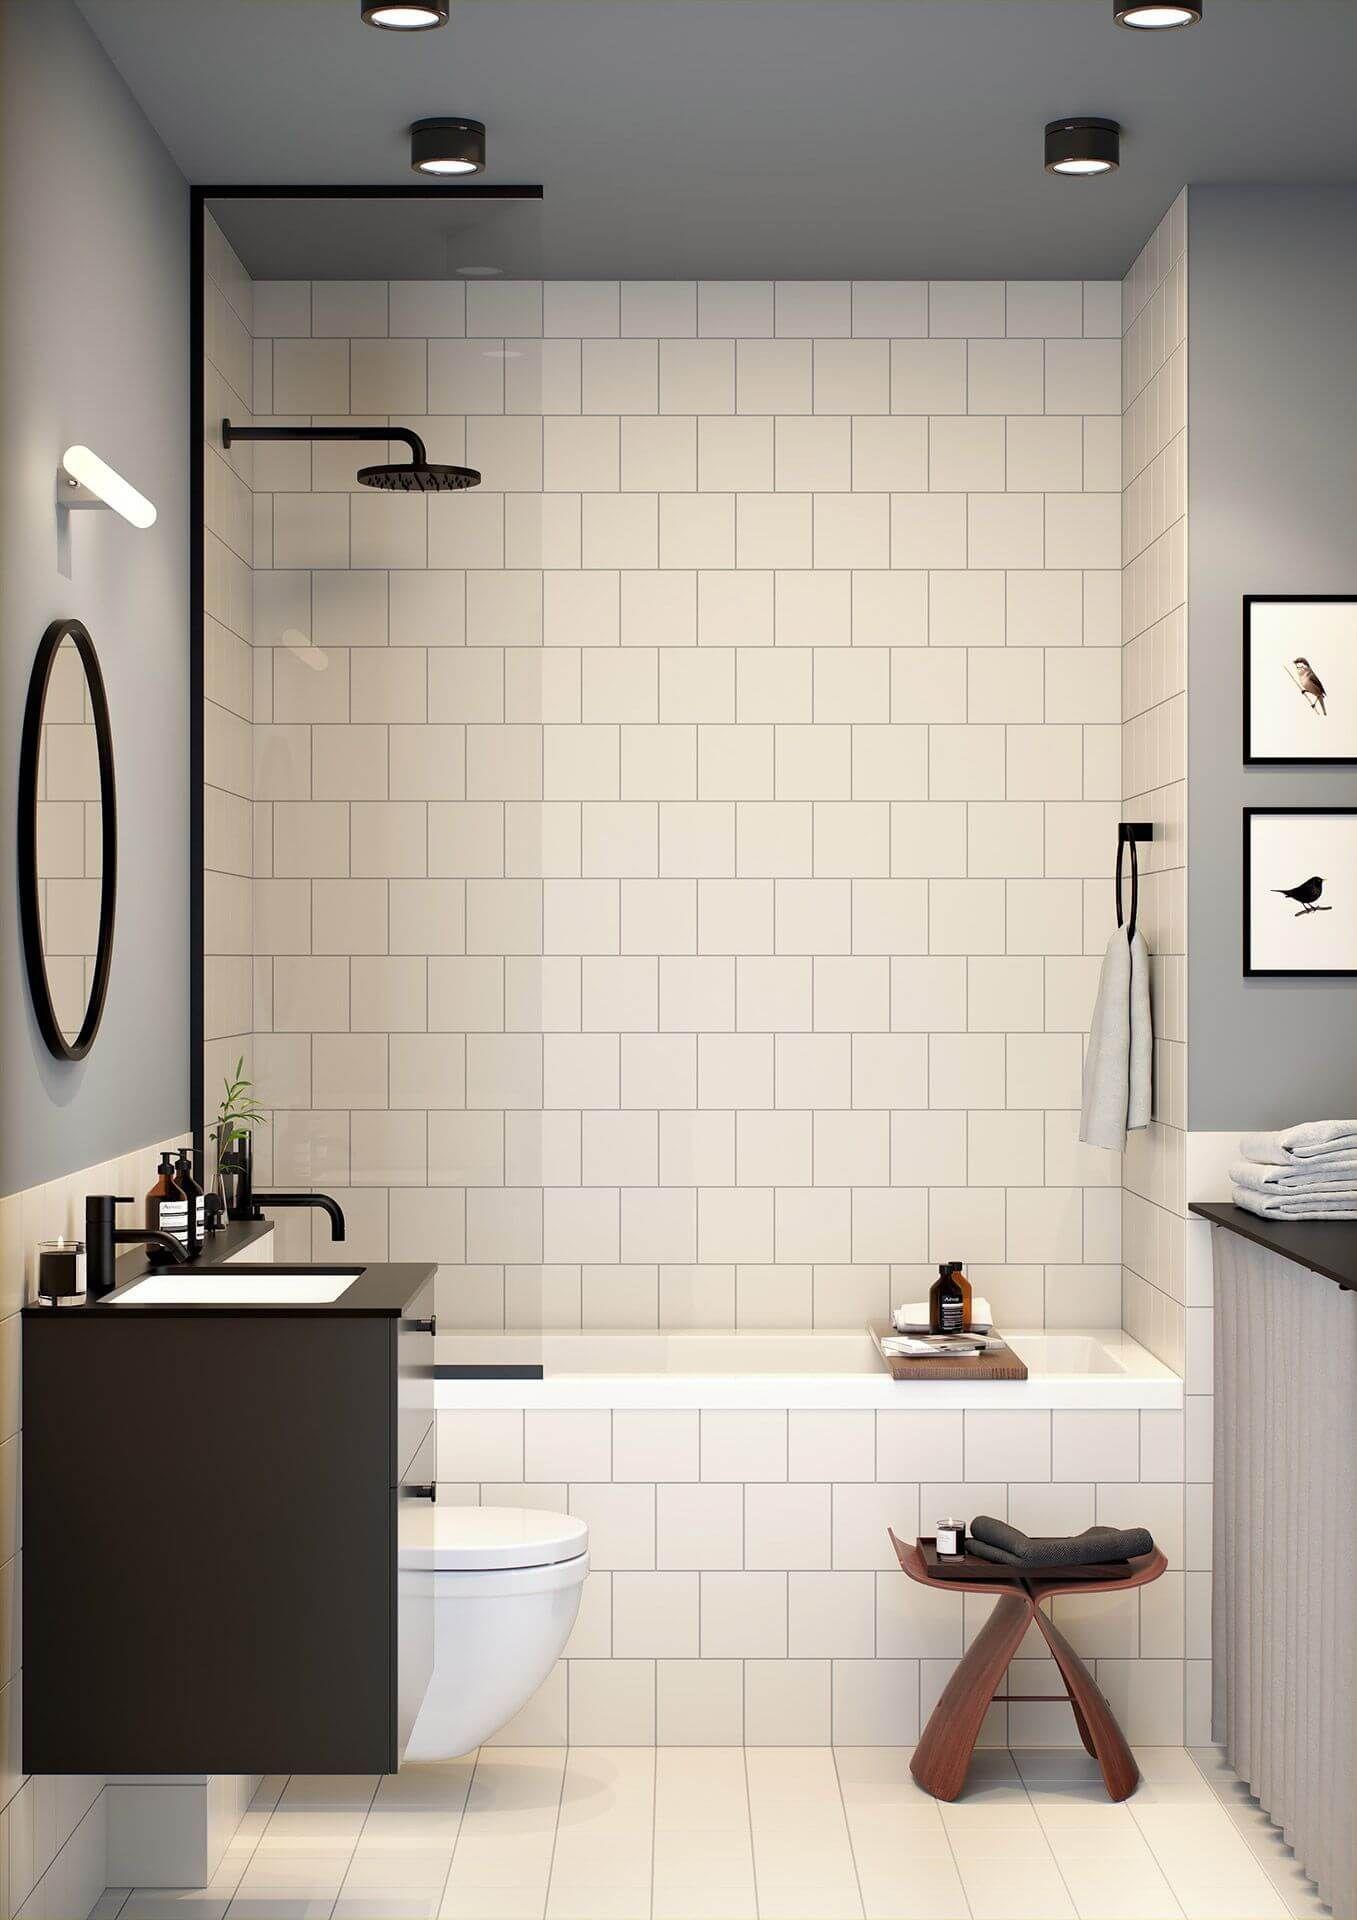 60 Small Bathroom Ideas 2020 Small But Stylish Designs In 2020 Bathroom Design Small Bathrooms Remodel Small Bathroom Makeover